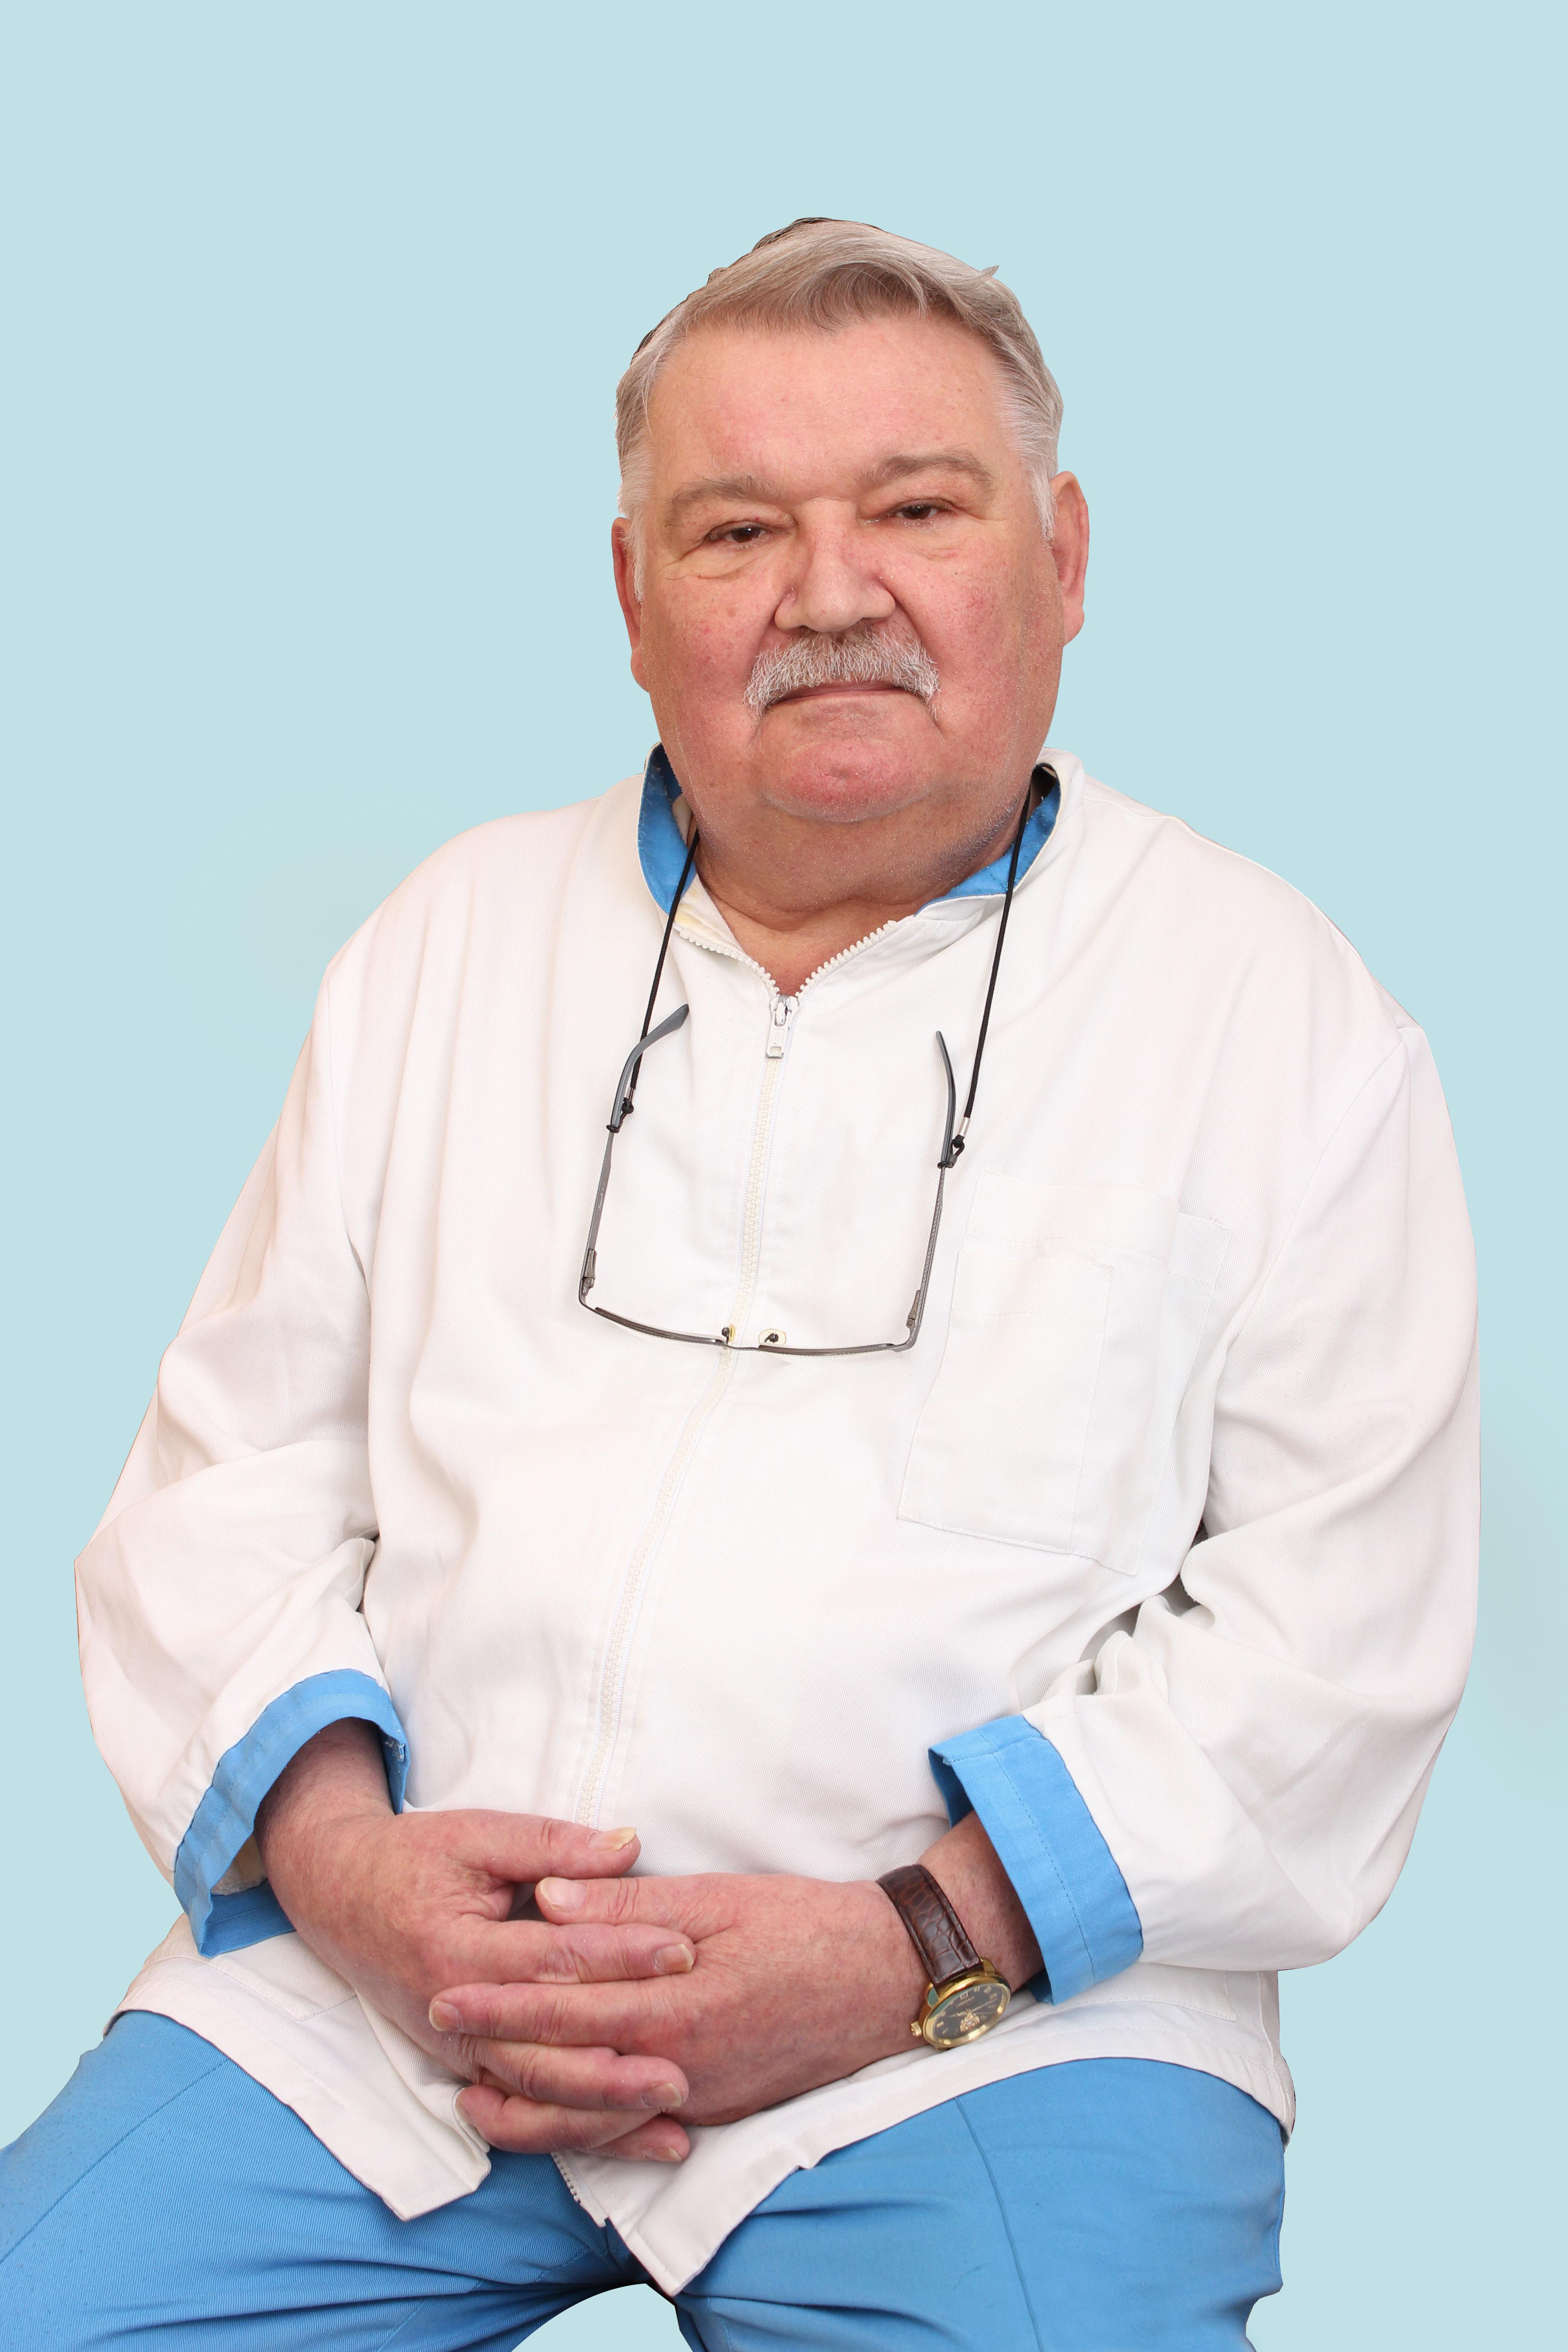 Врач-рефлексотерапевт Ручкин Игорь Николаевич